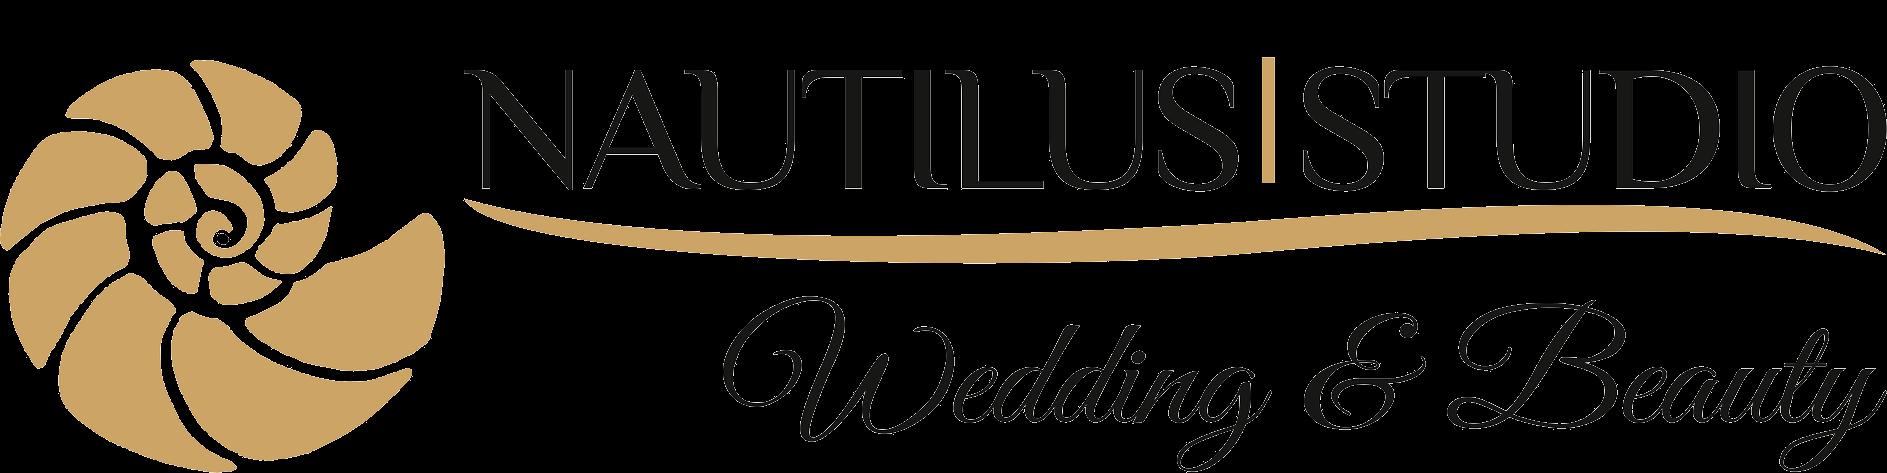 nautilus-logo-2-trans